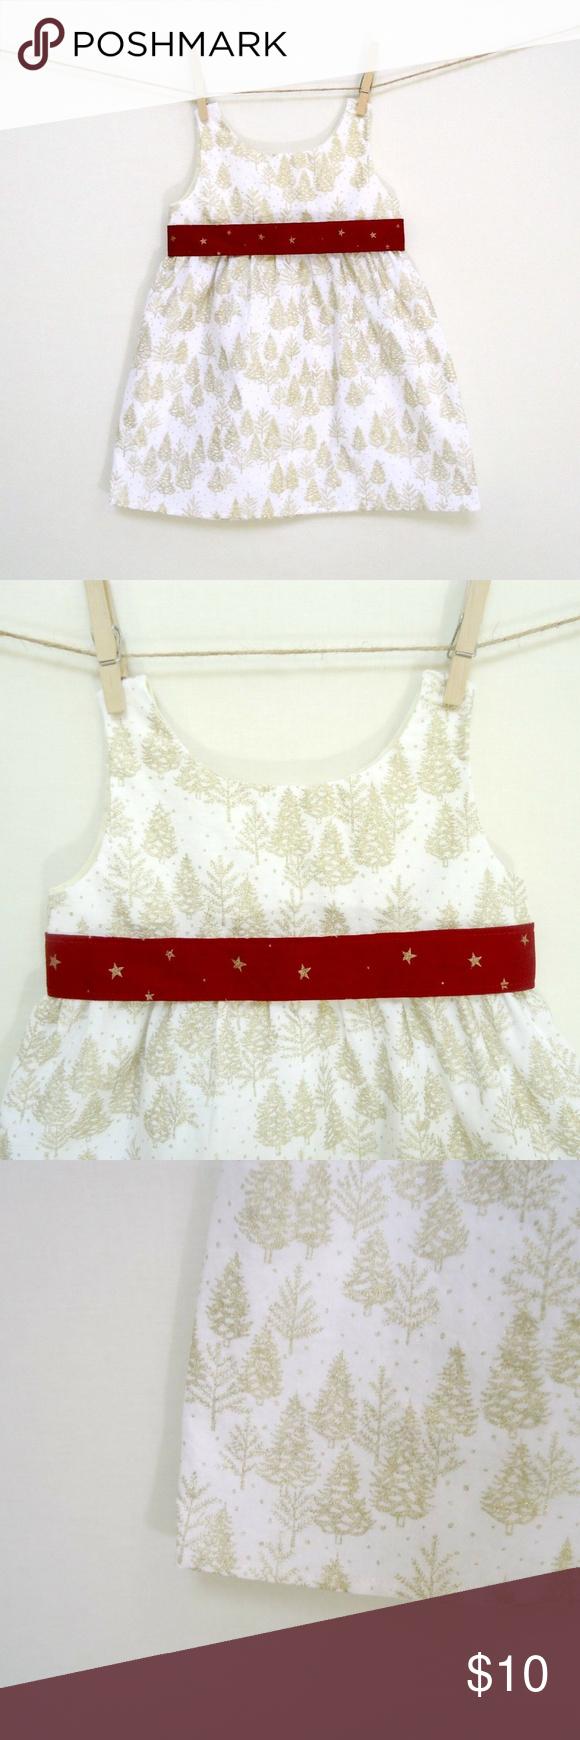 Girls White Dress Christmas Tree Print 2t In 2020 Girls White Dress Girls Ruffle Dress Girls Blue Dress [ 1740 x 580 Pixel ]